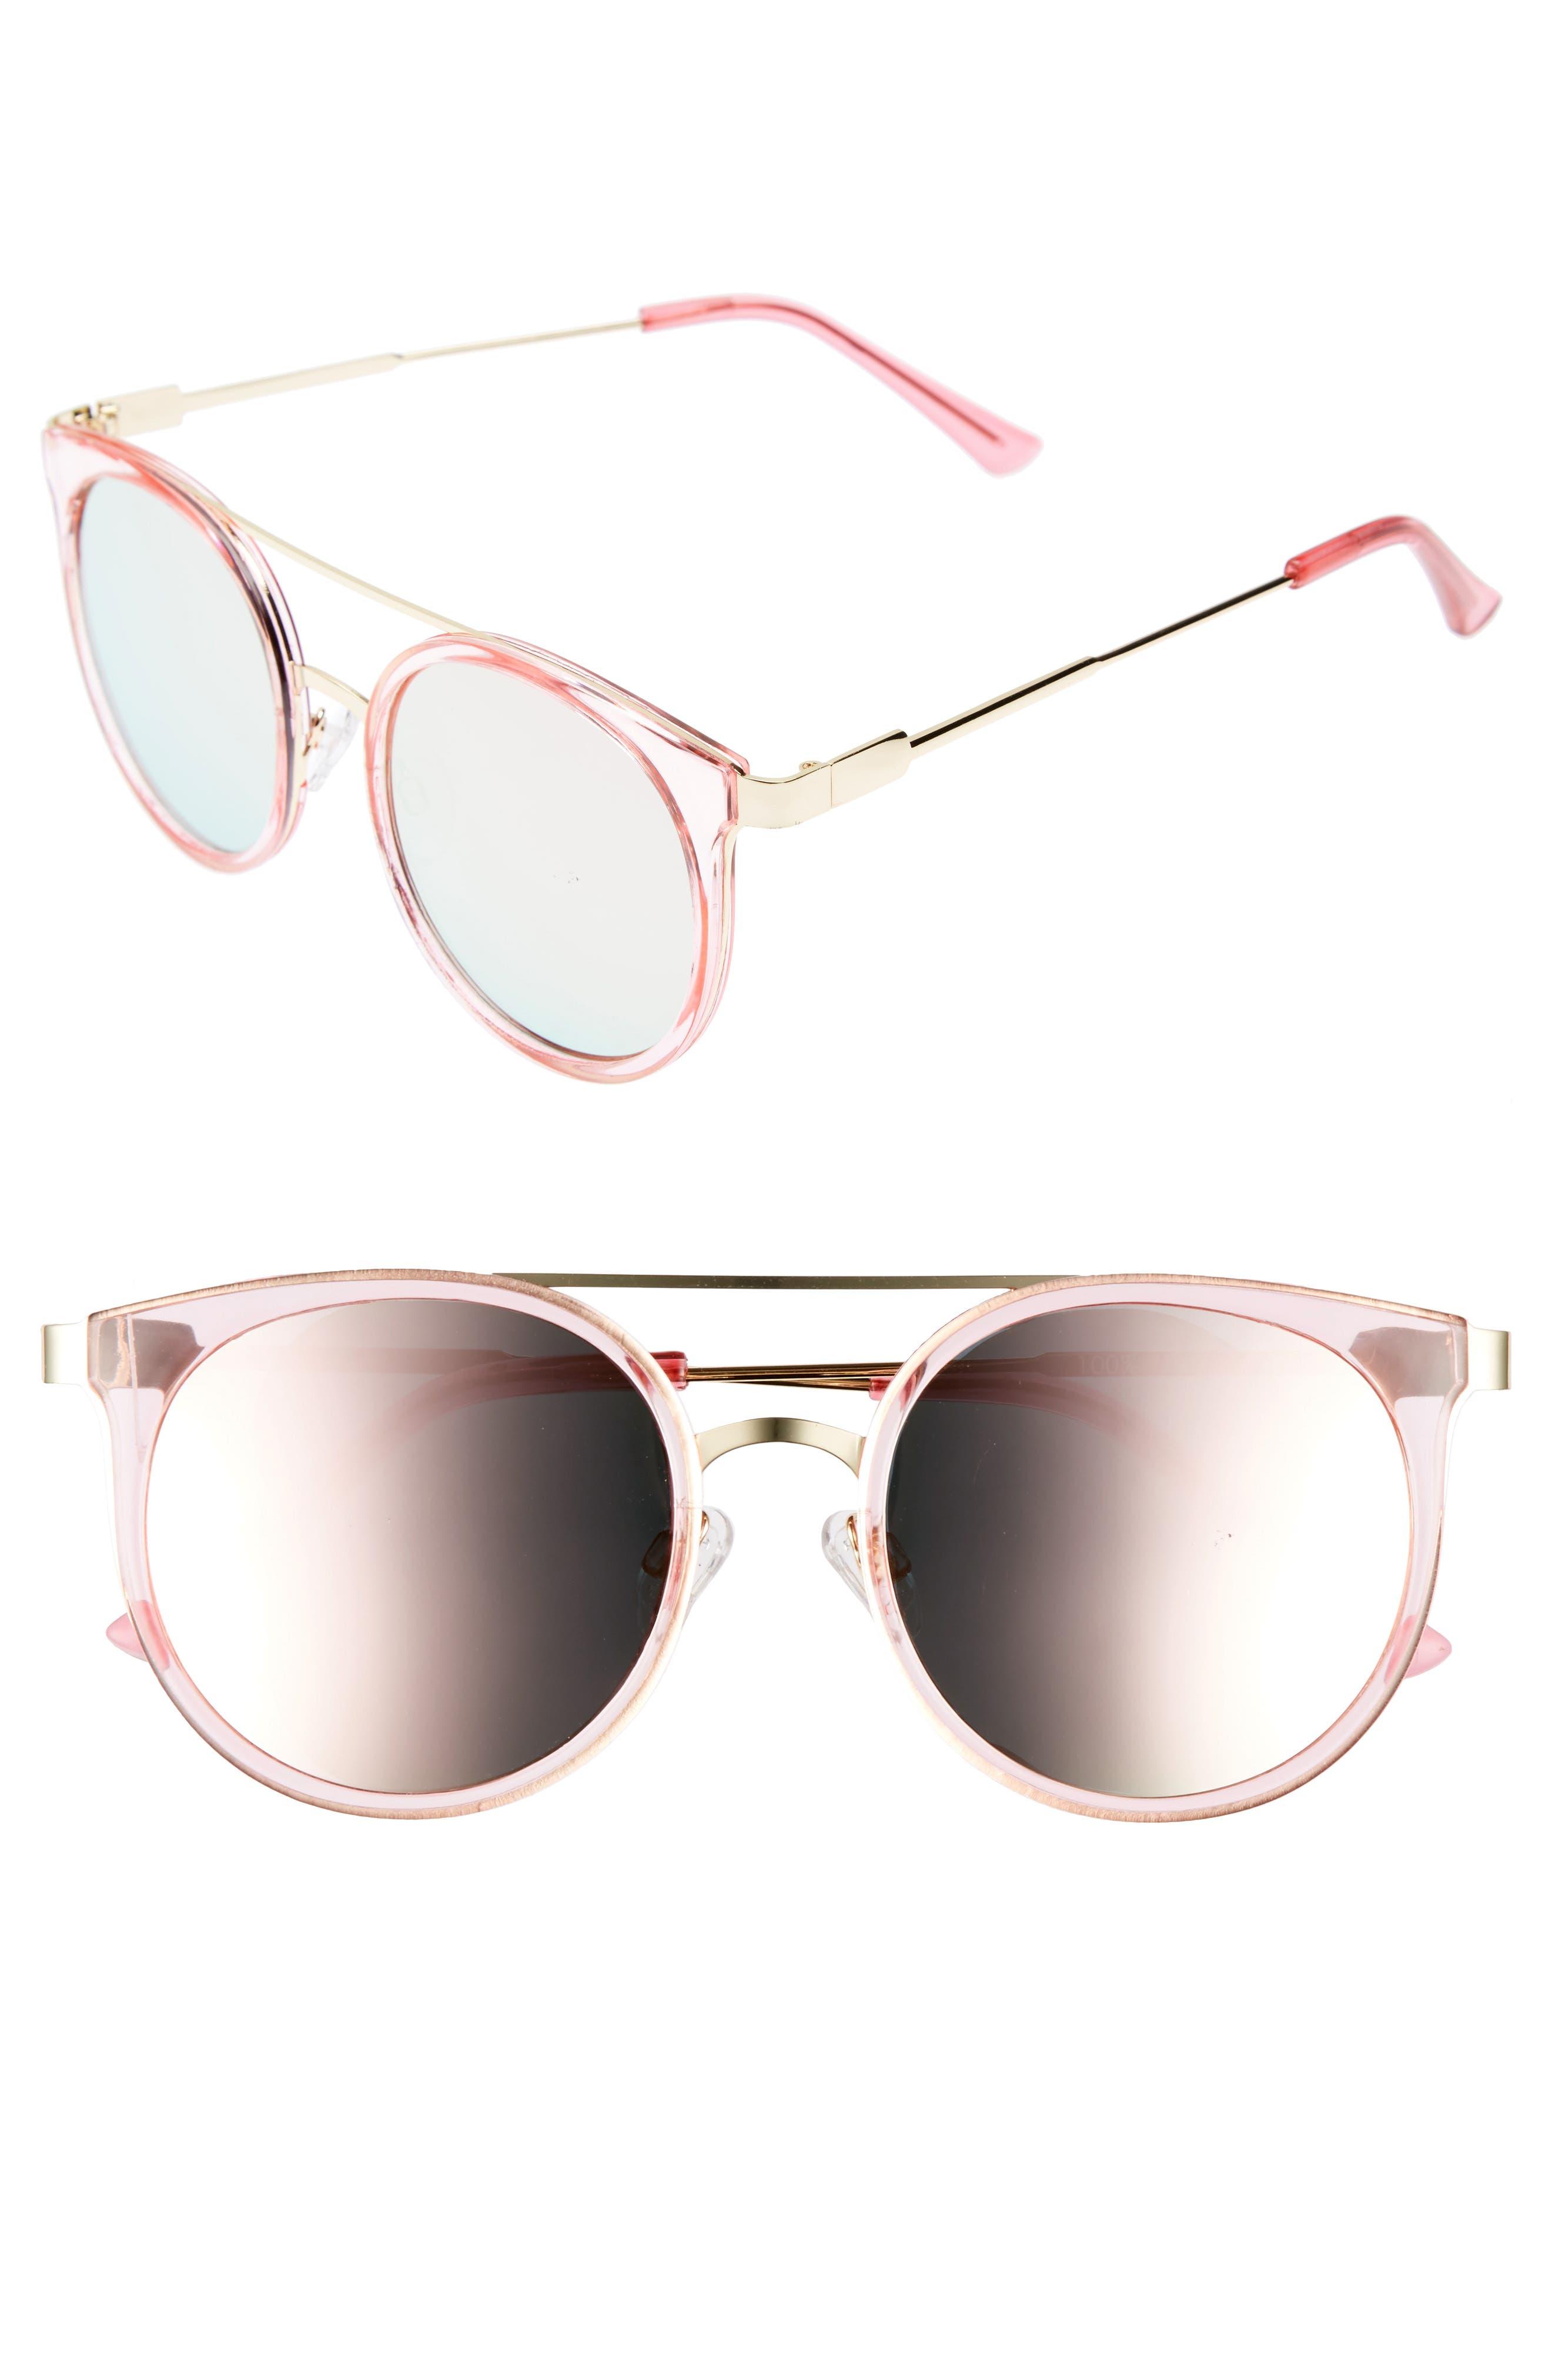 Leith 52mm Mirror Lens Round Sunglasses